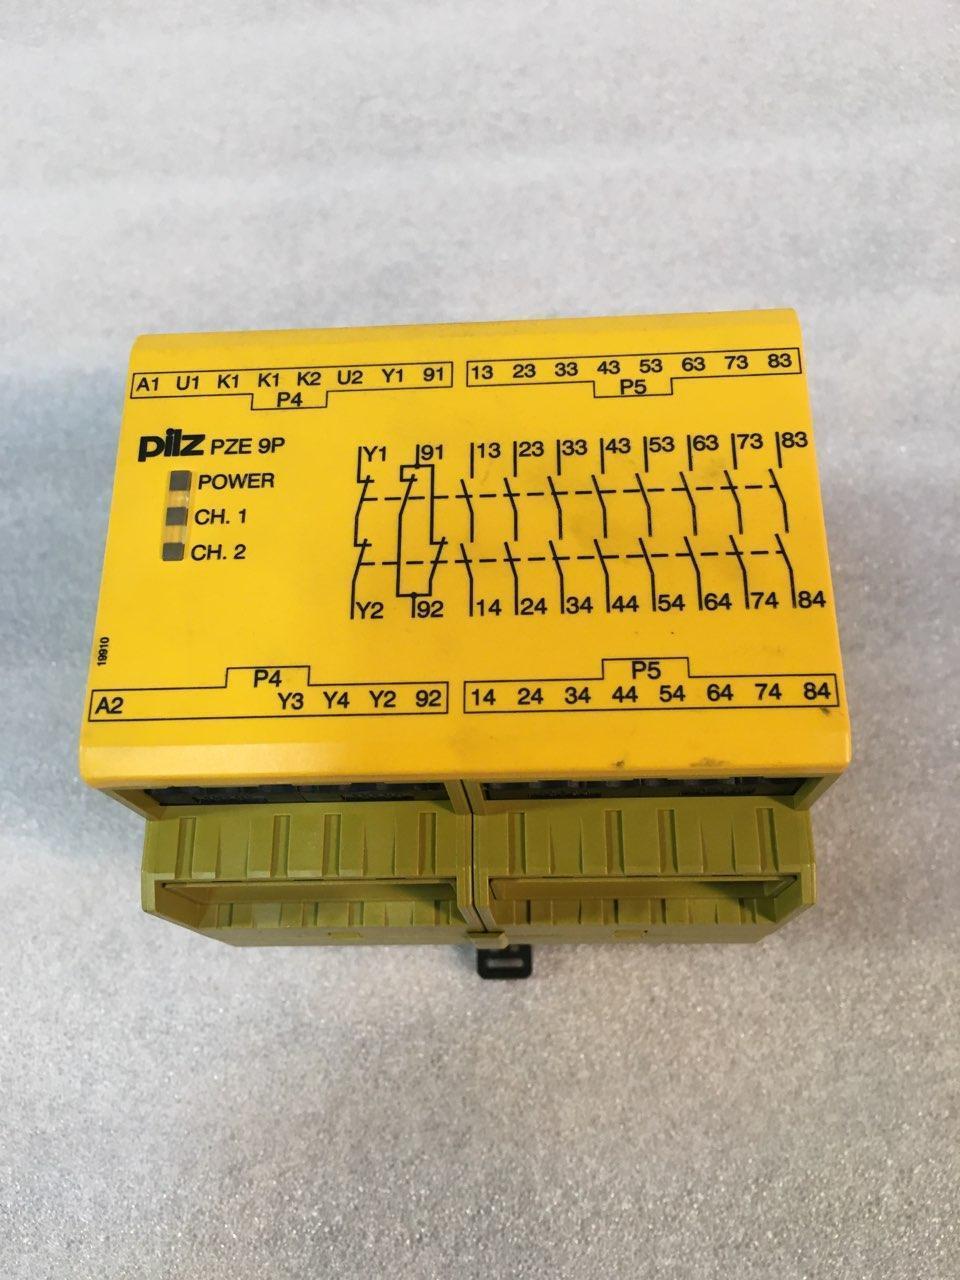 PILZ PZE 9P SAFETY RELAY, 777140, 24 VACDC  8n/o 1n/c, 3VA/3W, 50-60 Hz